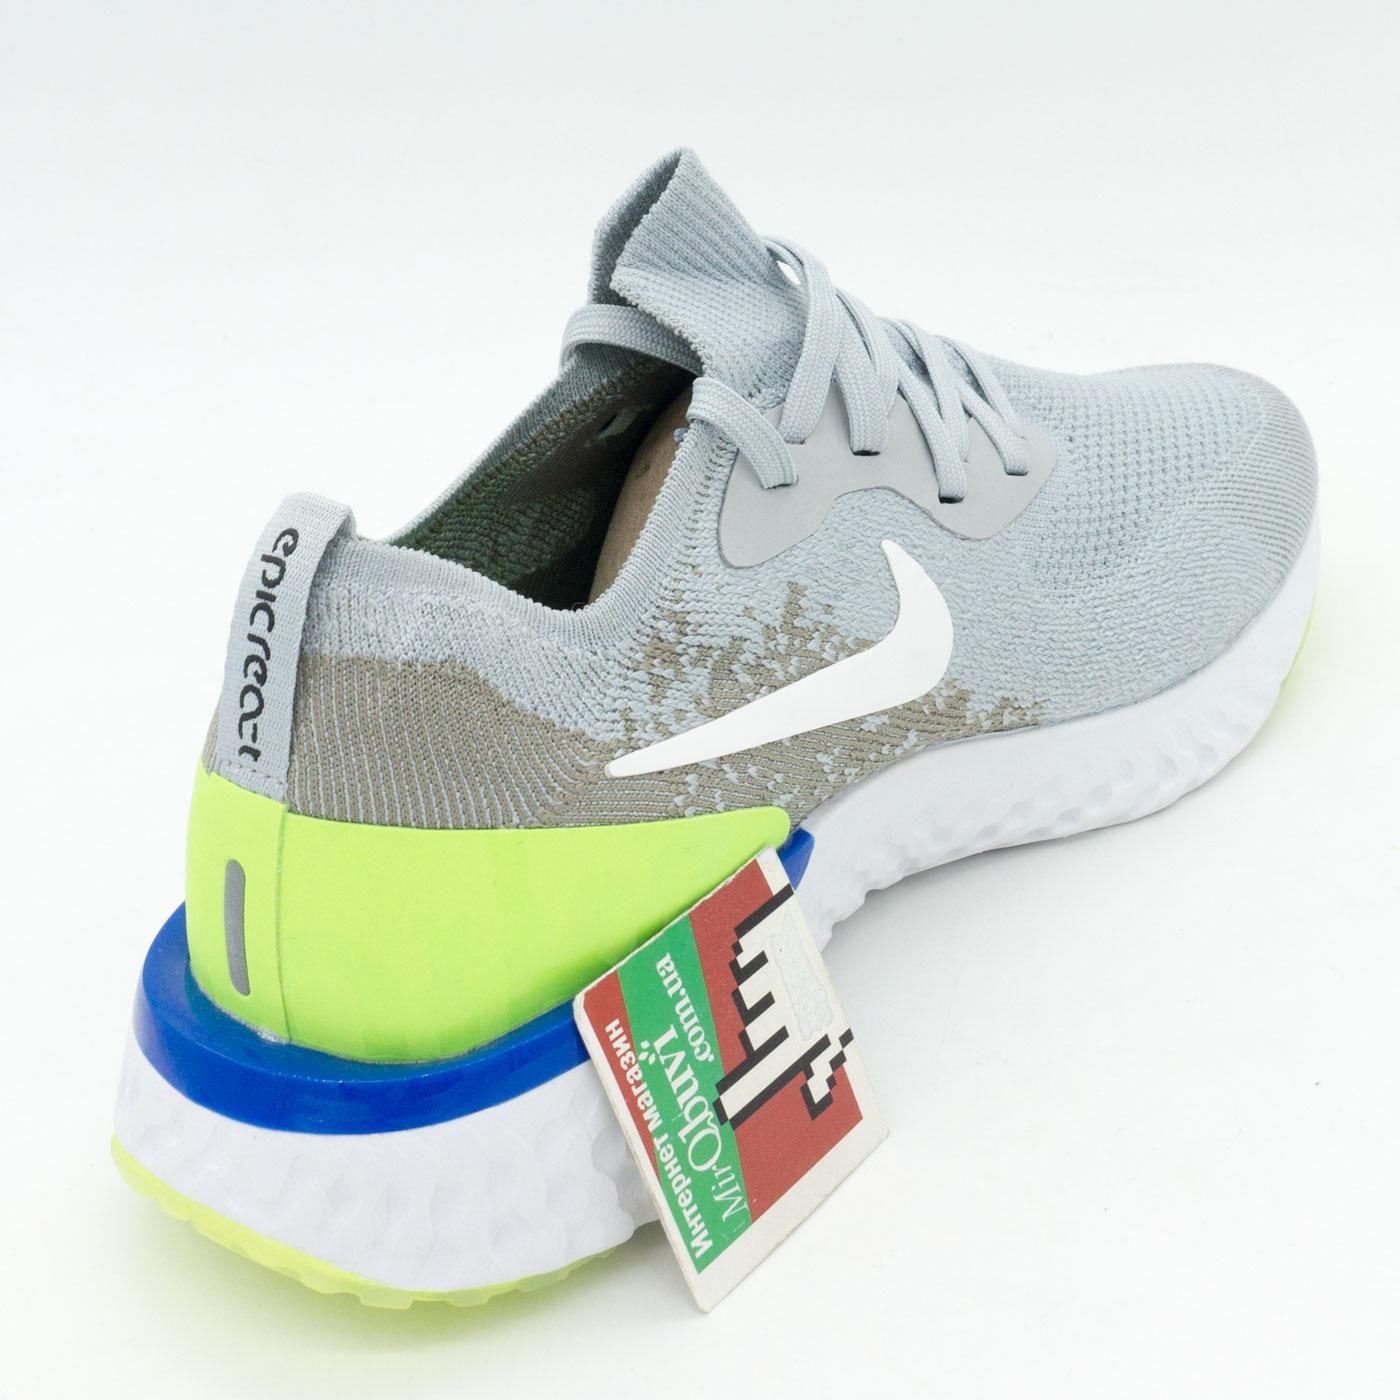 фото back Мужские кроссовки для бега Nike Epic React Flyknit серые. Топ качество! back